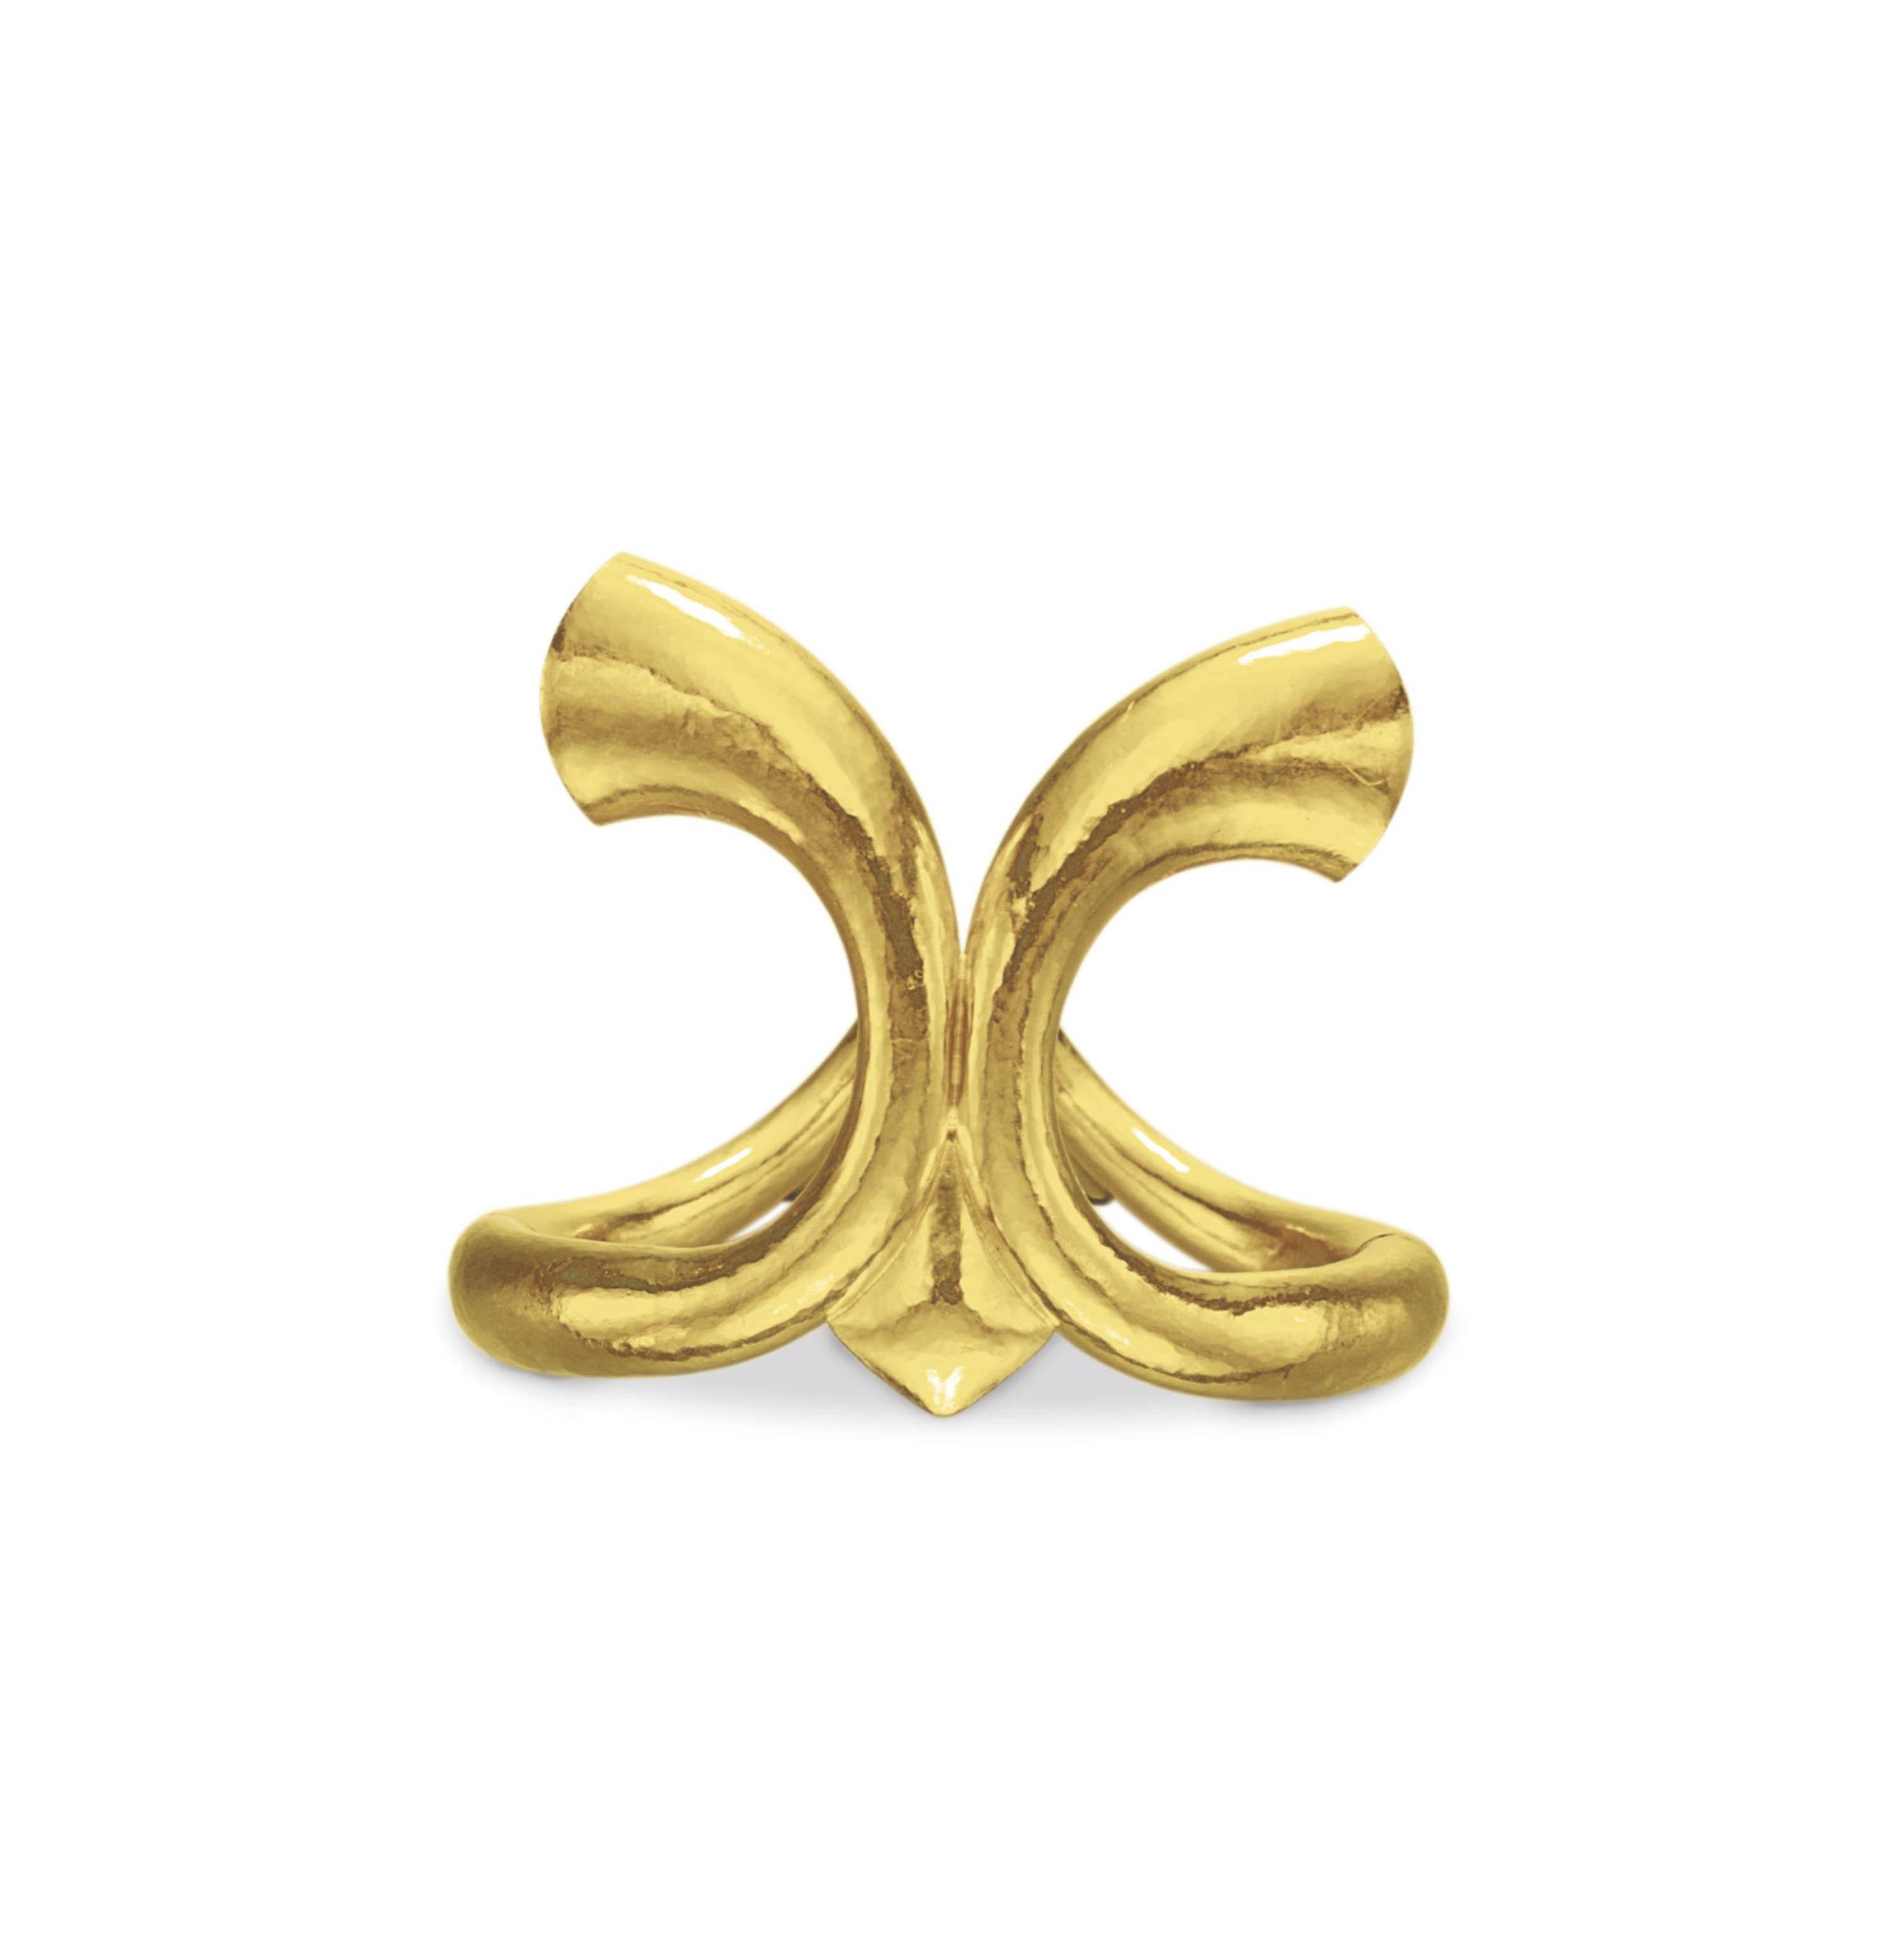 A GOLD CUFF BRACELET, BY ILIAS LALAOUNIS